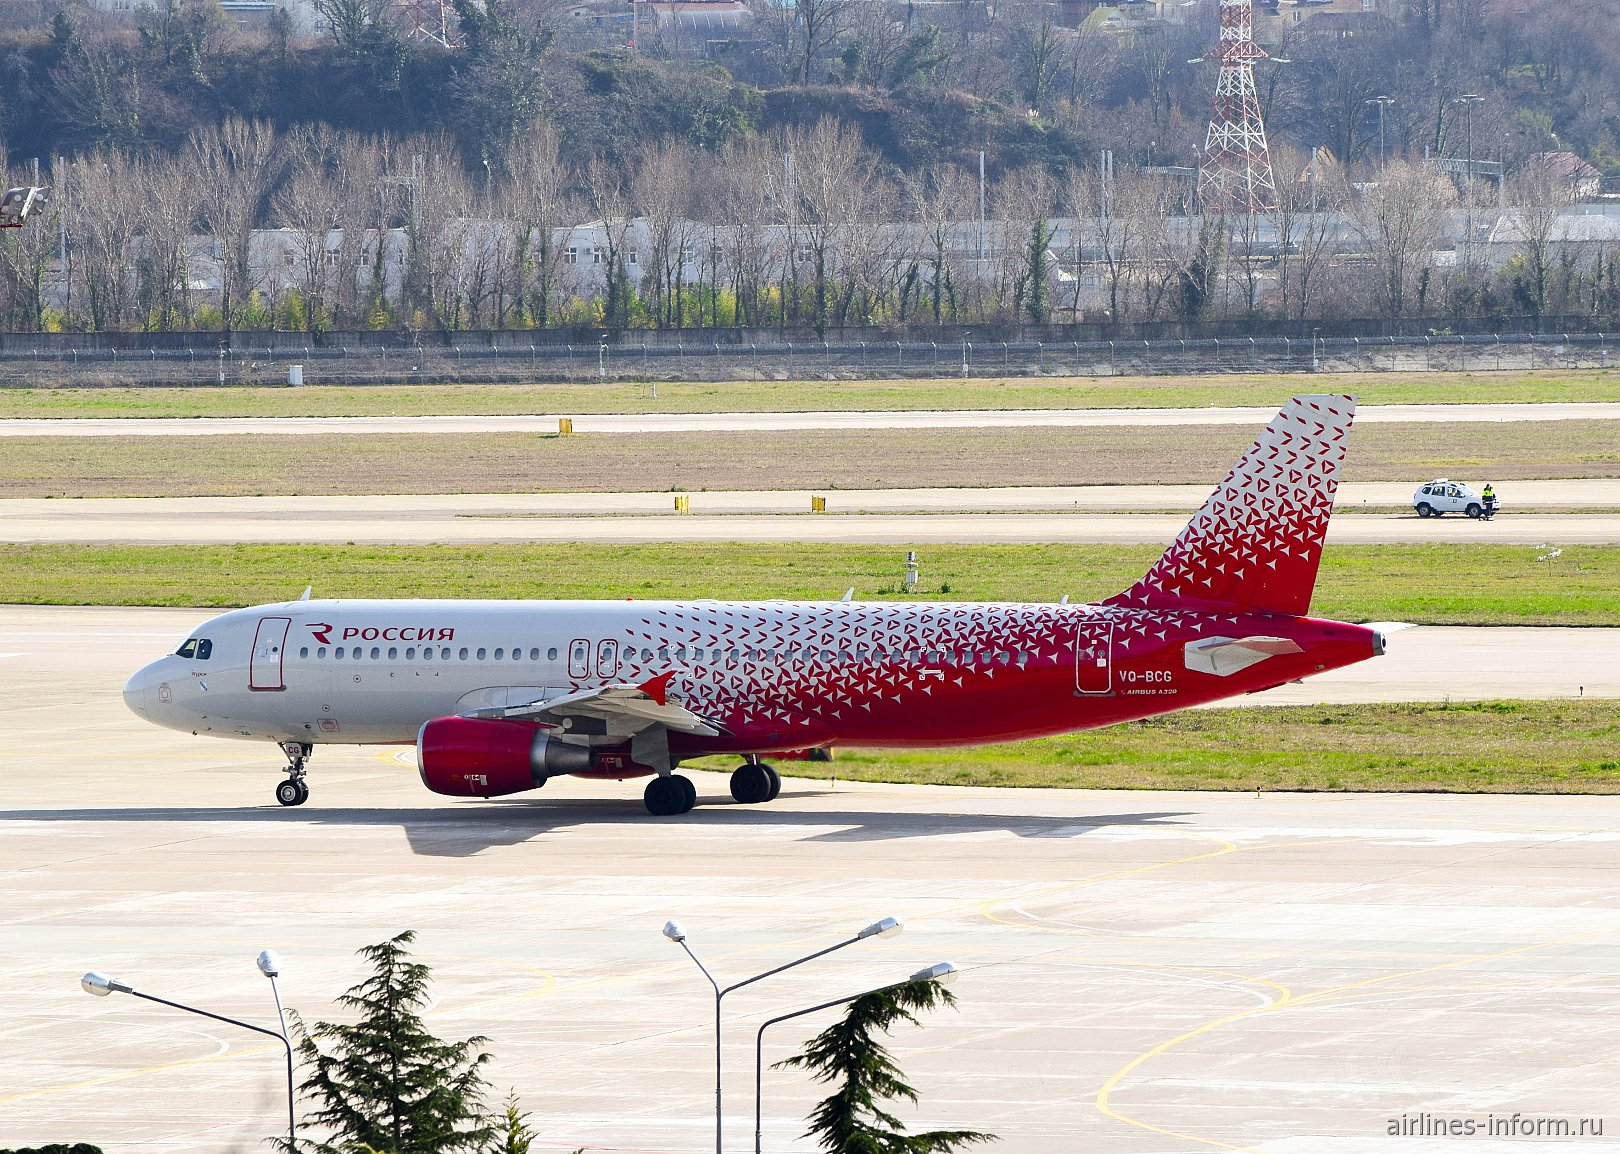 "Сочи - Санкт-Петербург, Россия, Airbus A320-214, VQ-BCG ""Курск"""